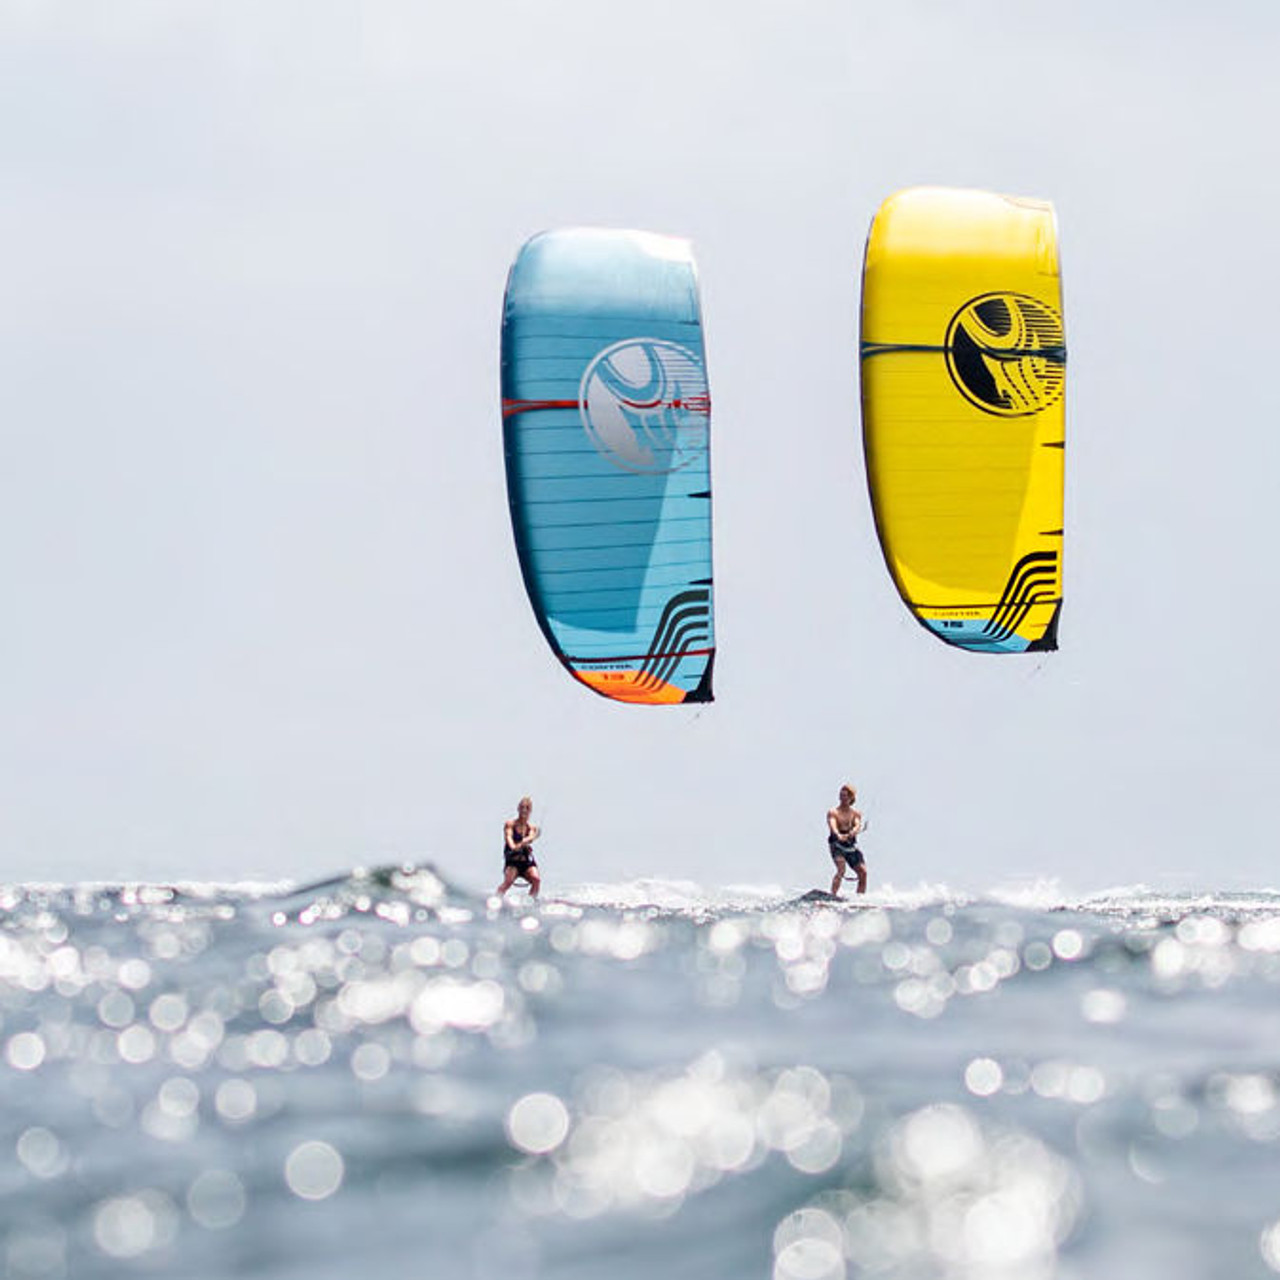 Cabrinha Standard Size Kite Pump for Kitesurfing Kiteboarding NEW